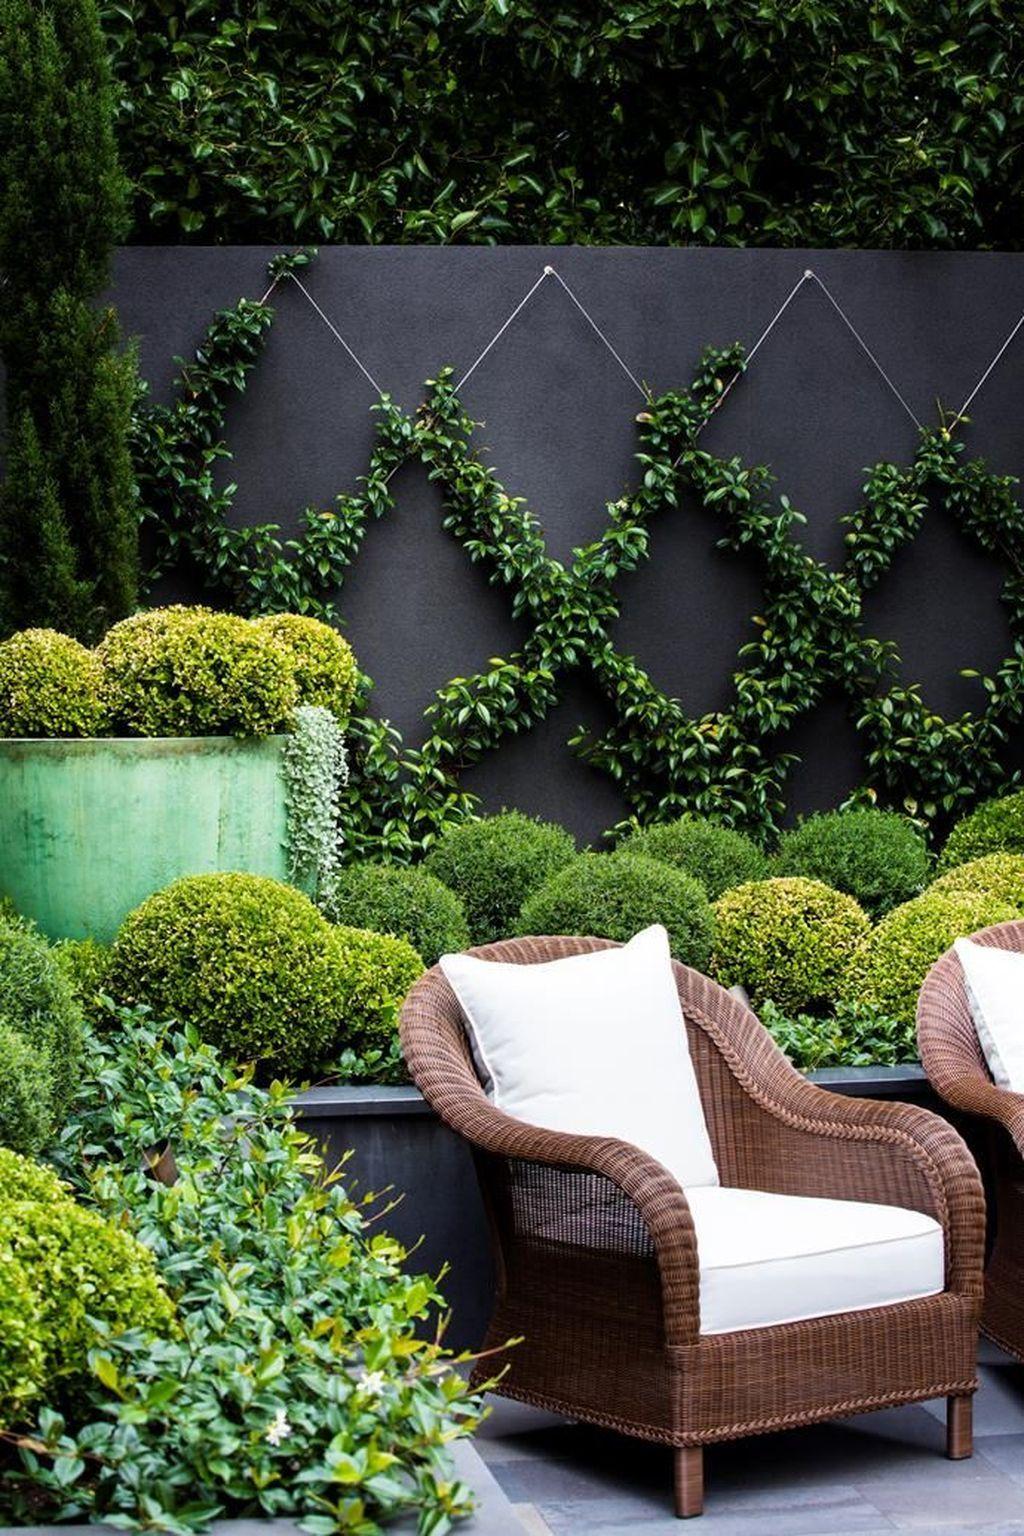 48 Amazing Wall Climbing Plants Ideas To Beautify Your Backyard